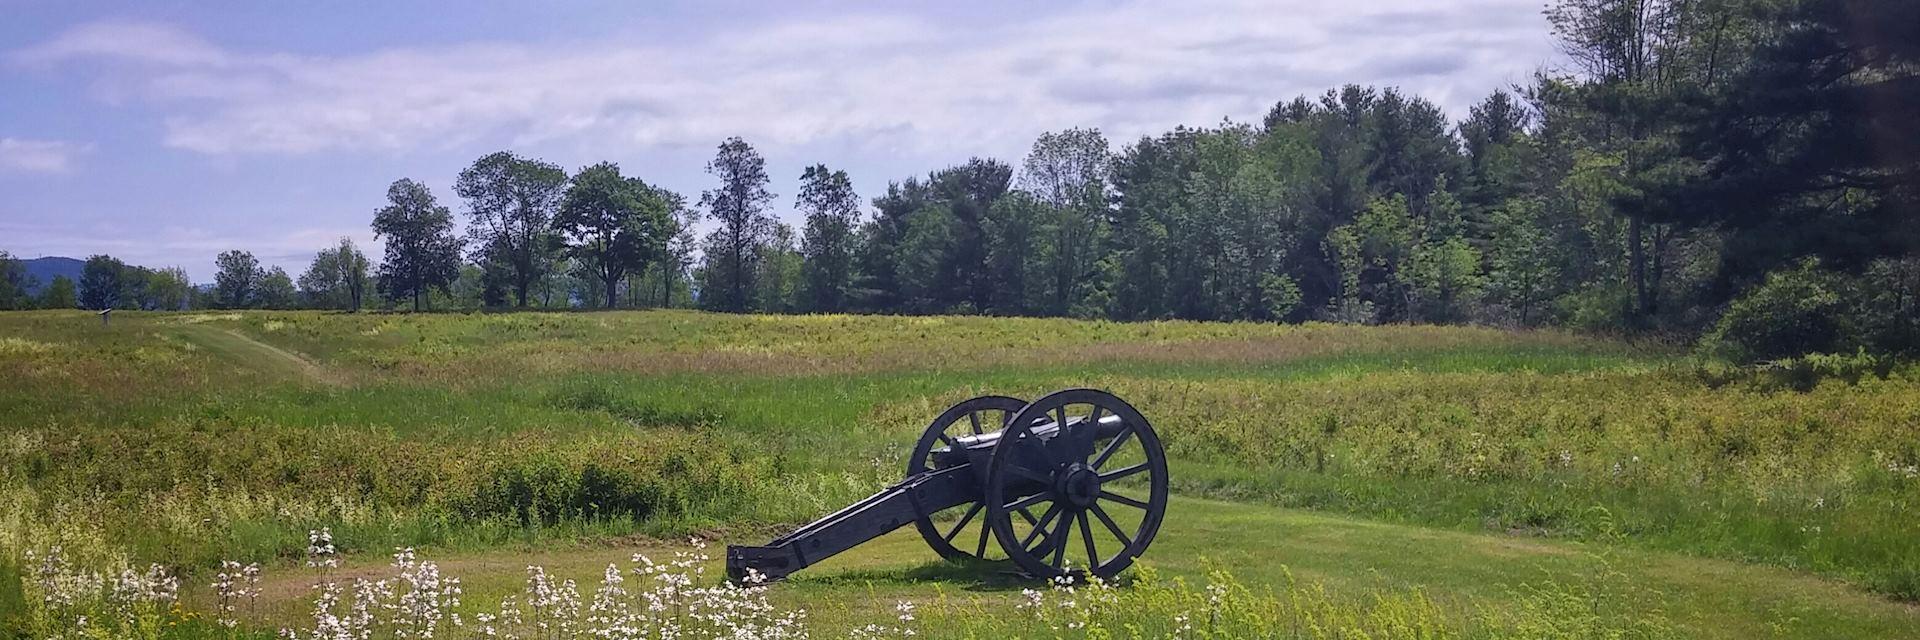 Saratoga National Historical Park, Saratoga Springs